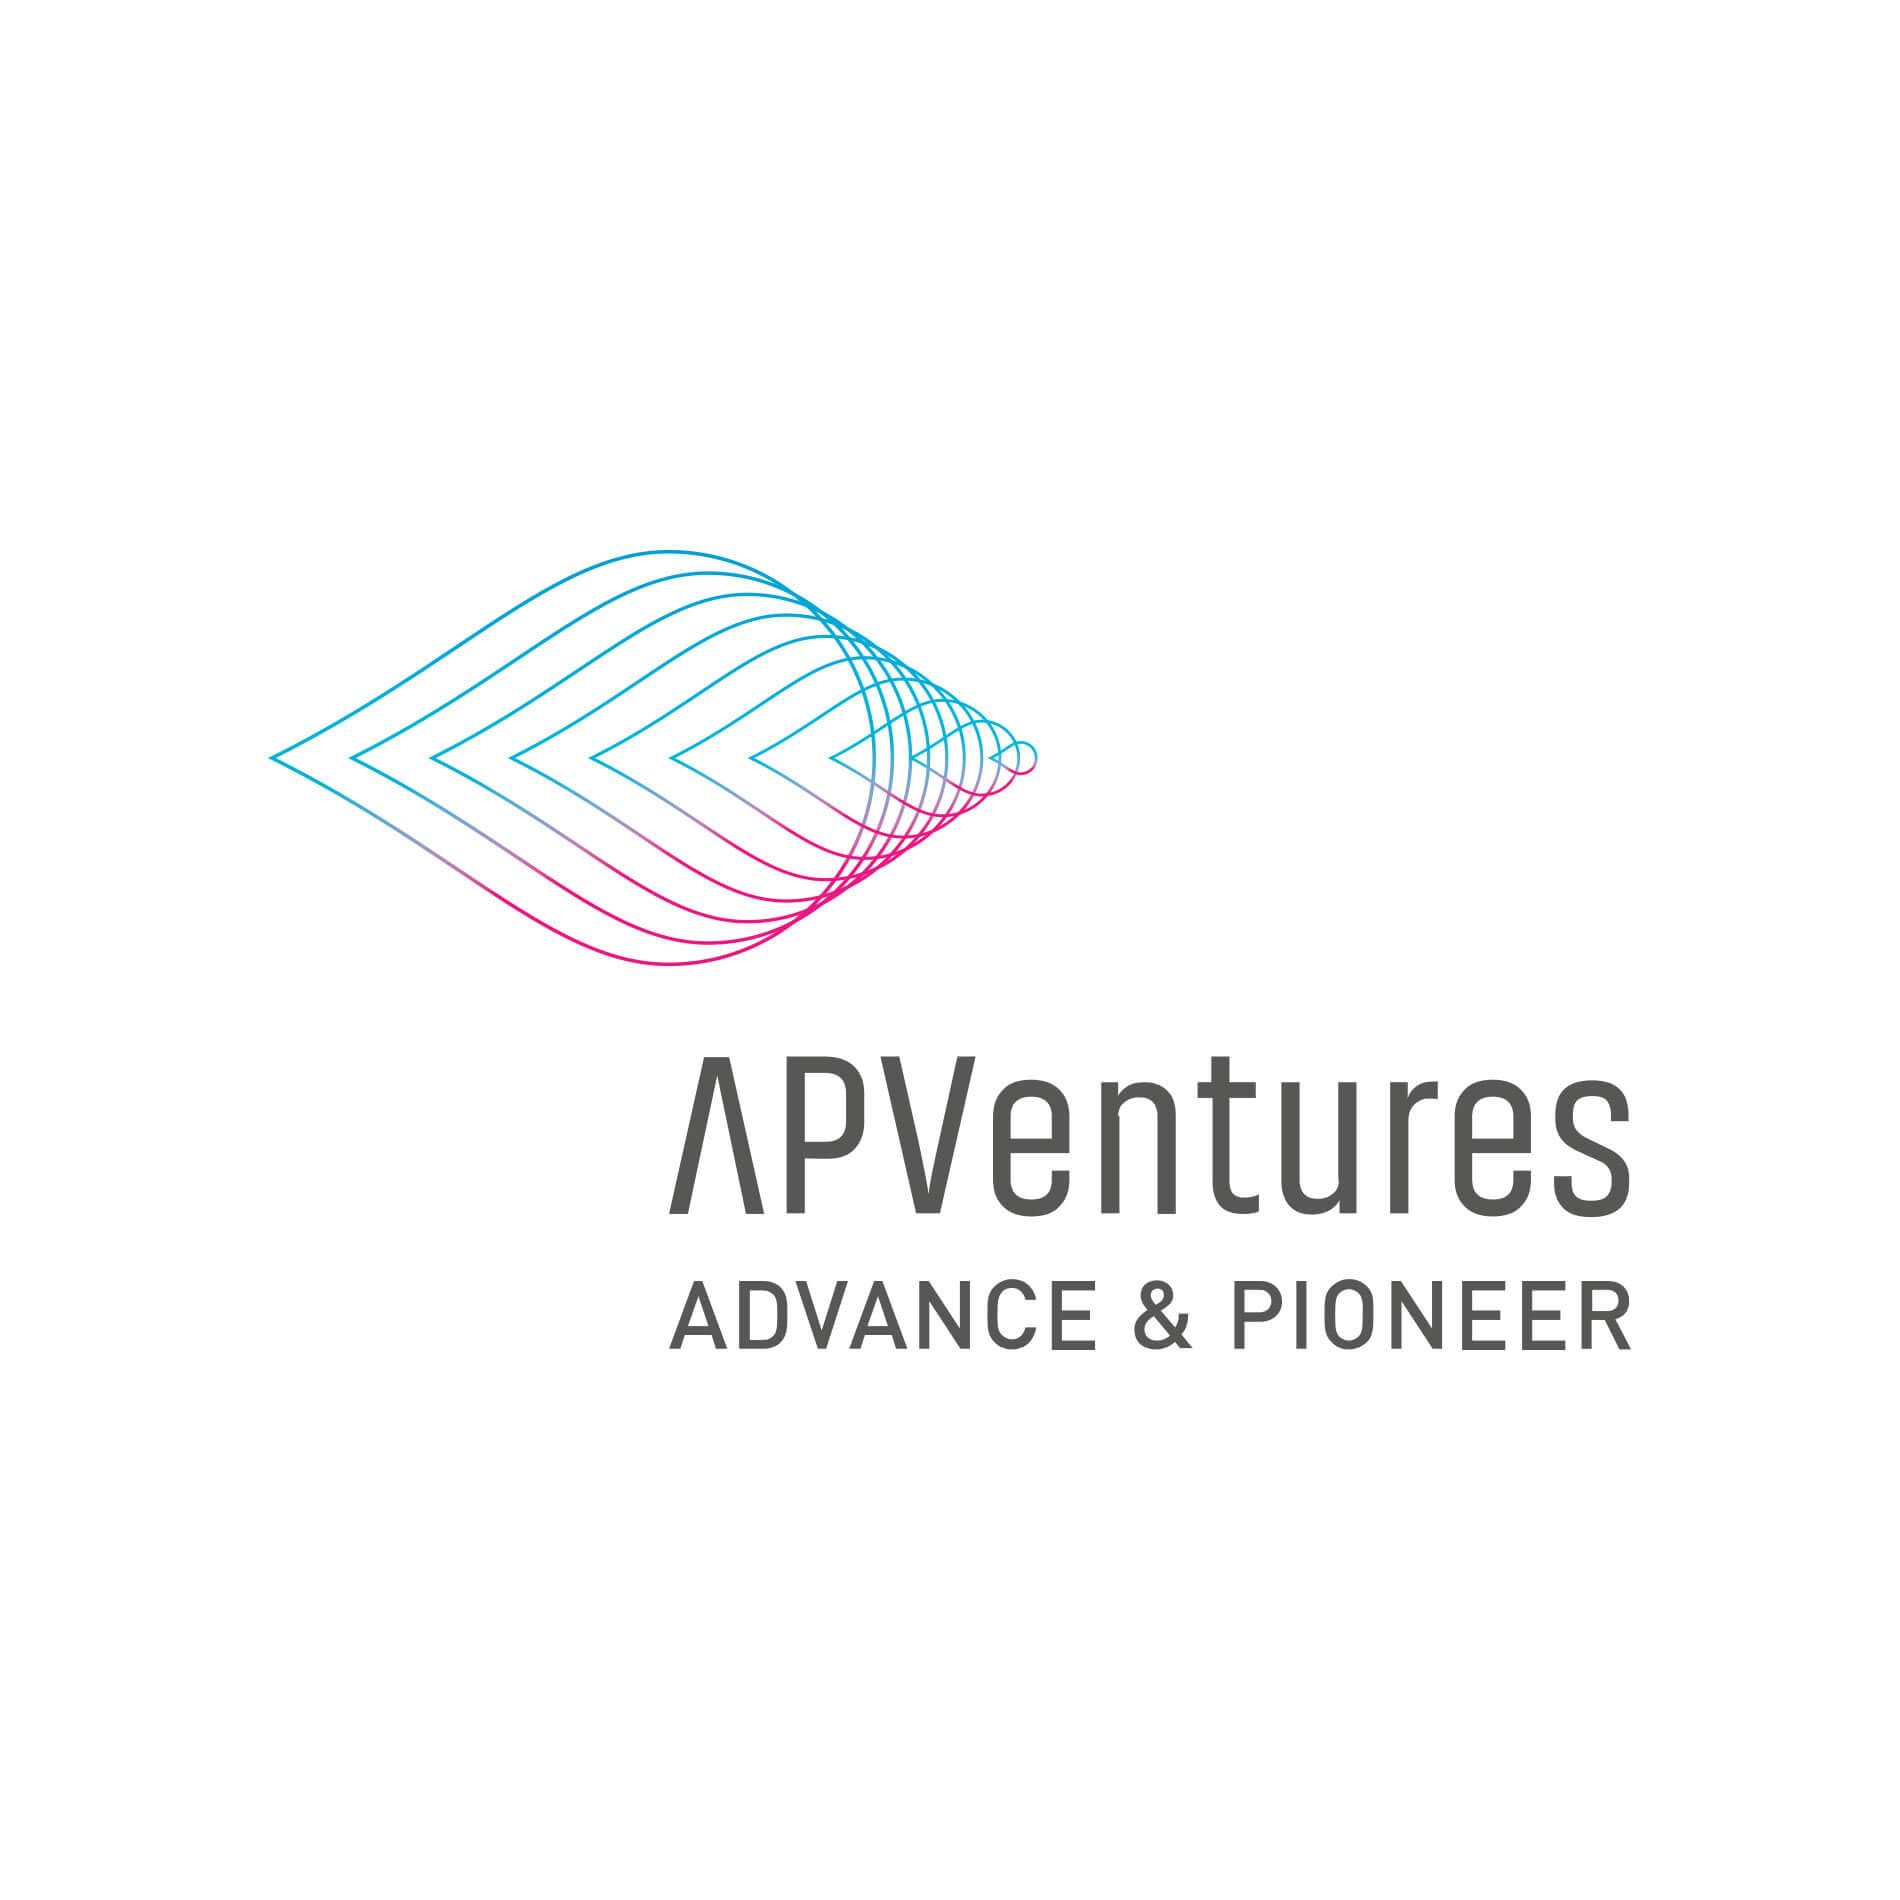 AP Ventures logo